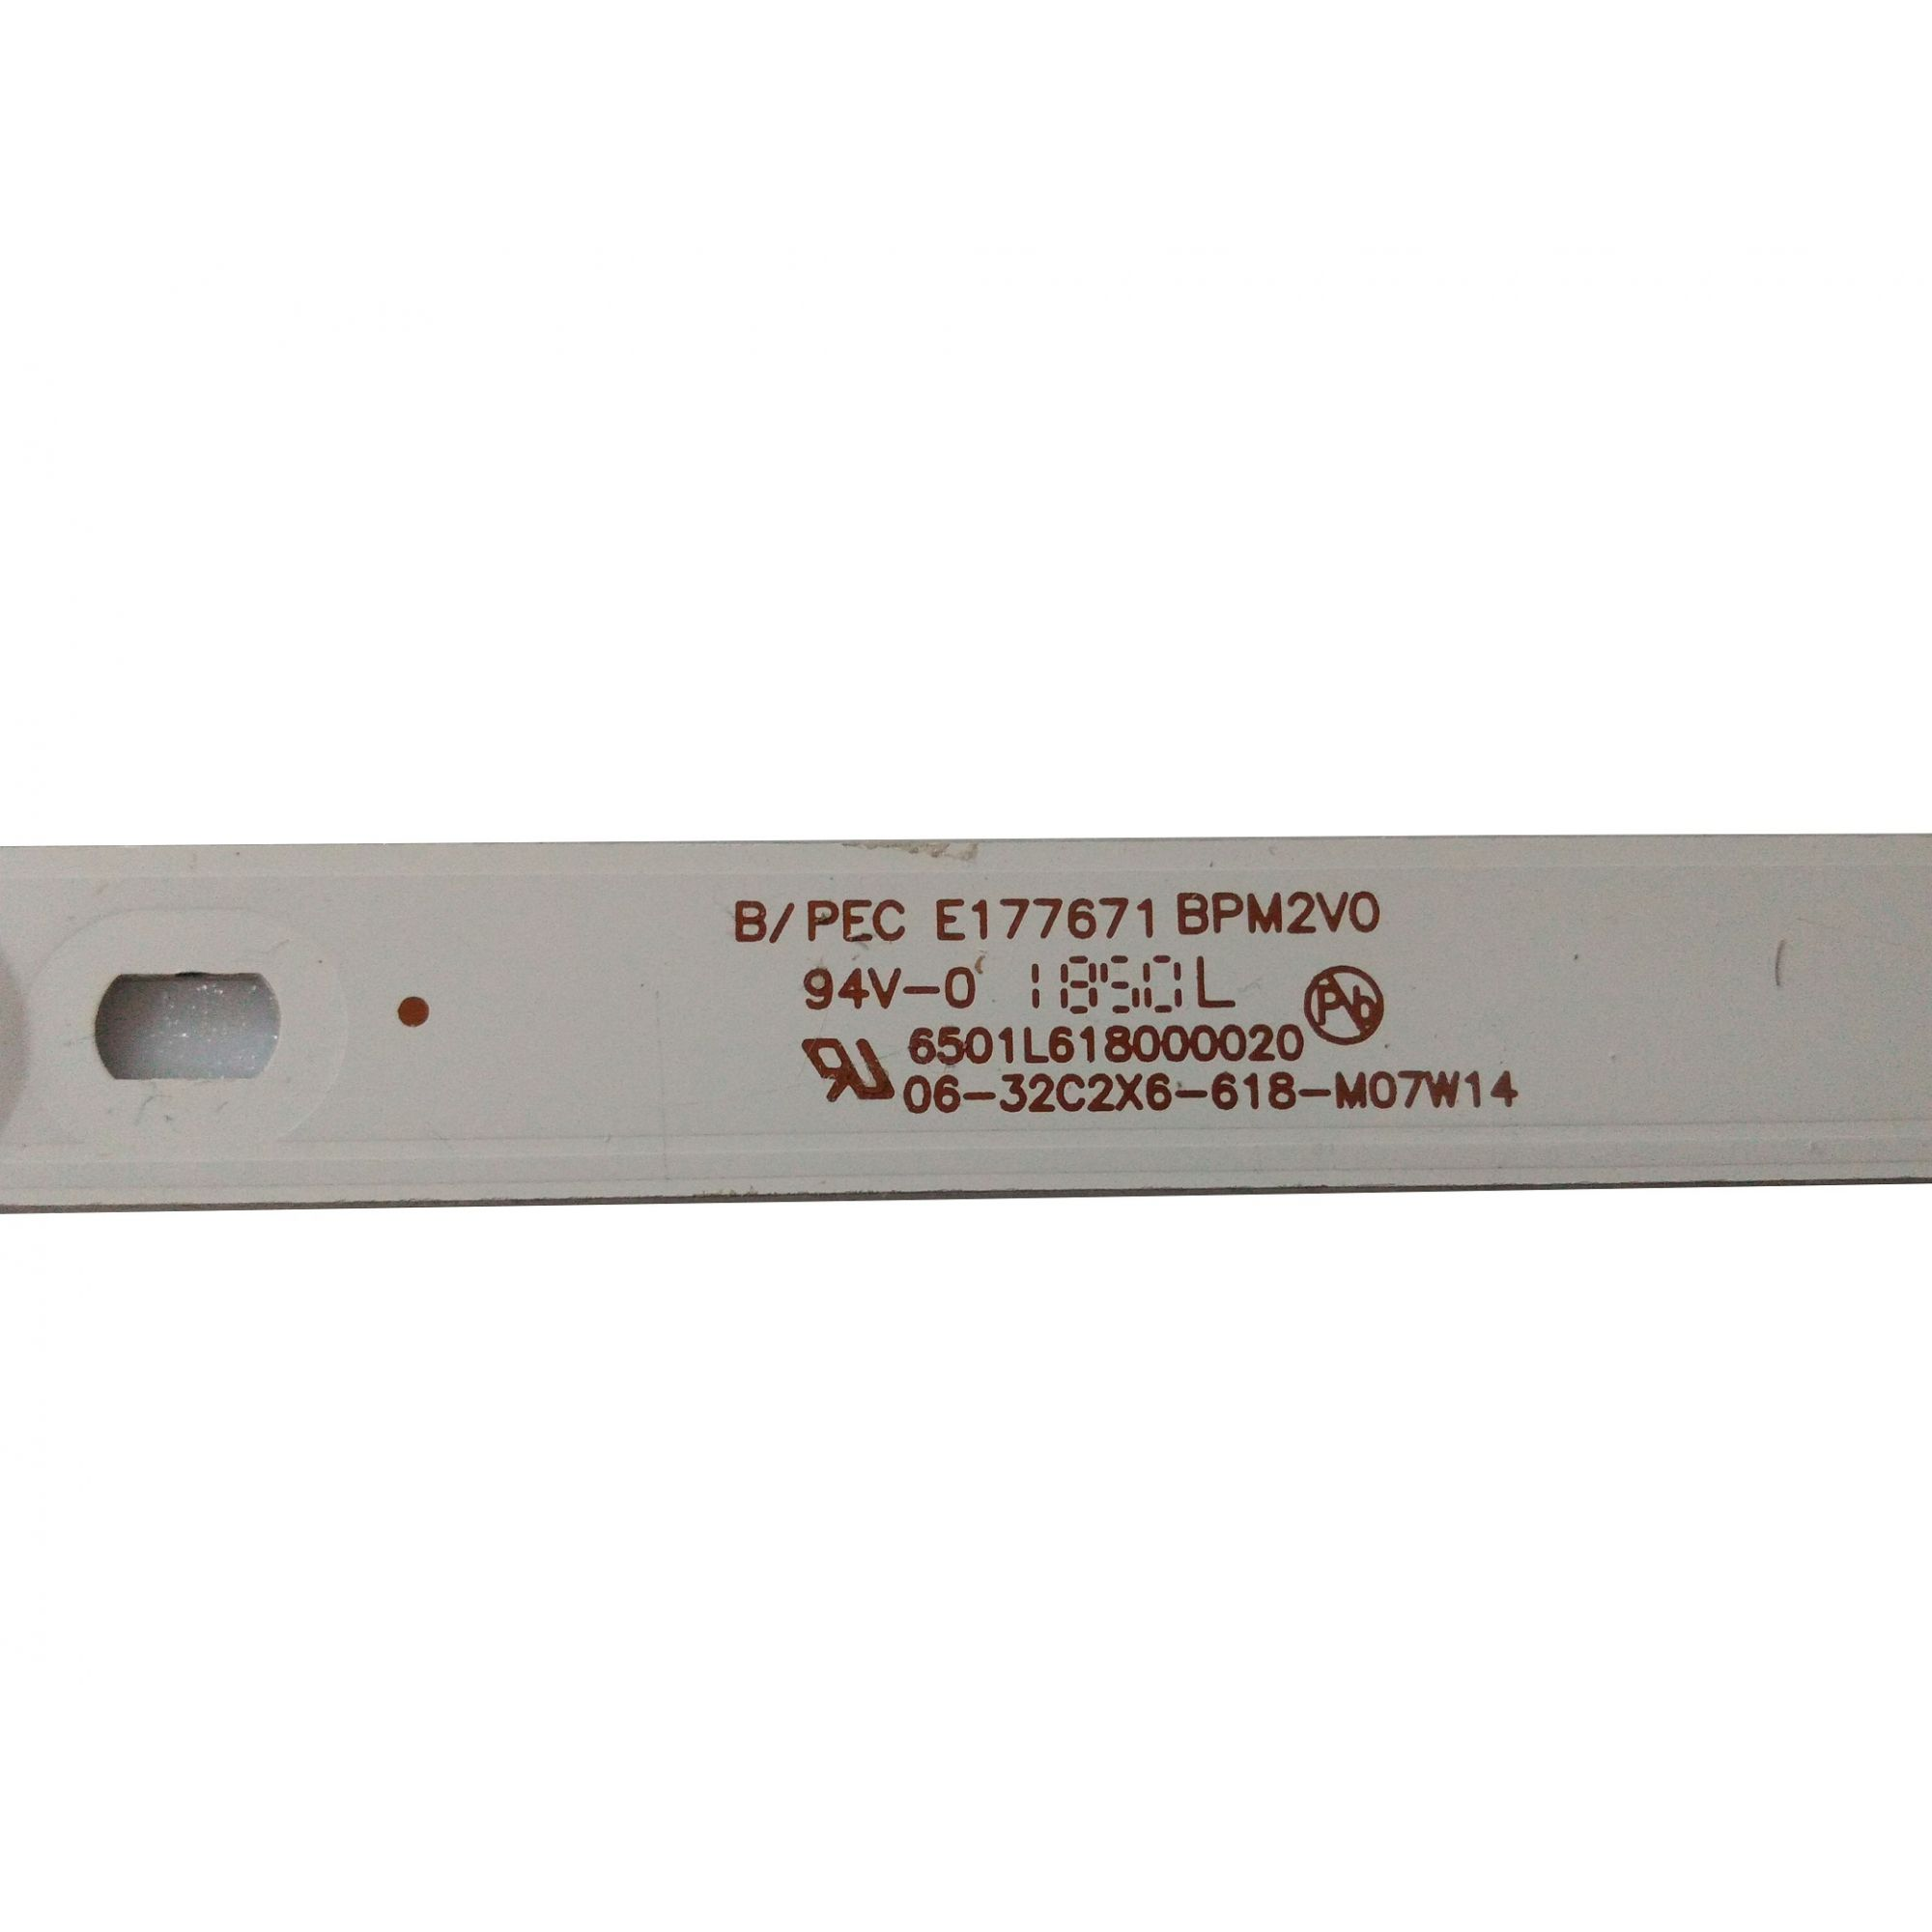 KIT BARRA DE LED PHILCO PTV32C30D 06-32C2X6-618-M07W14